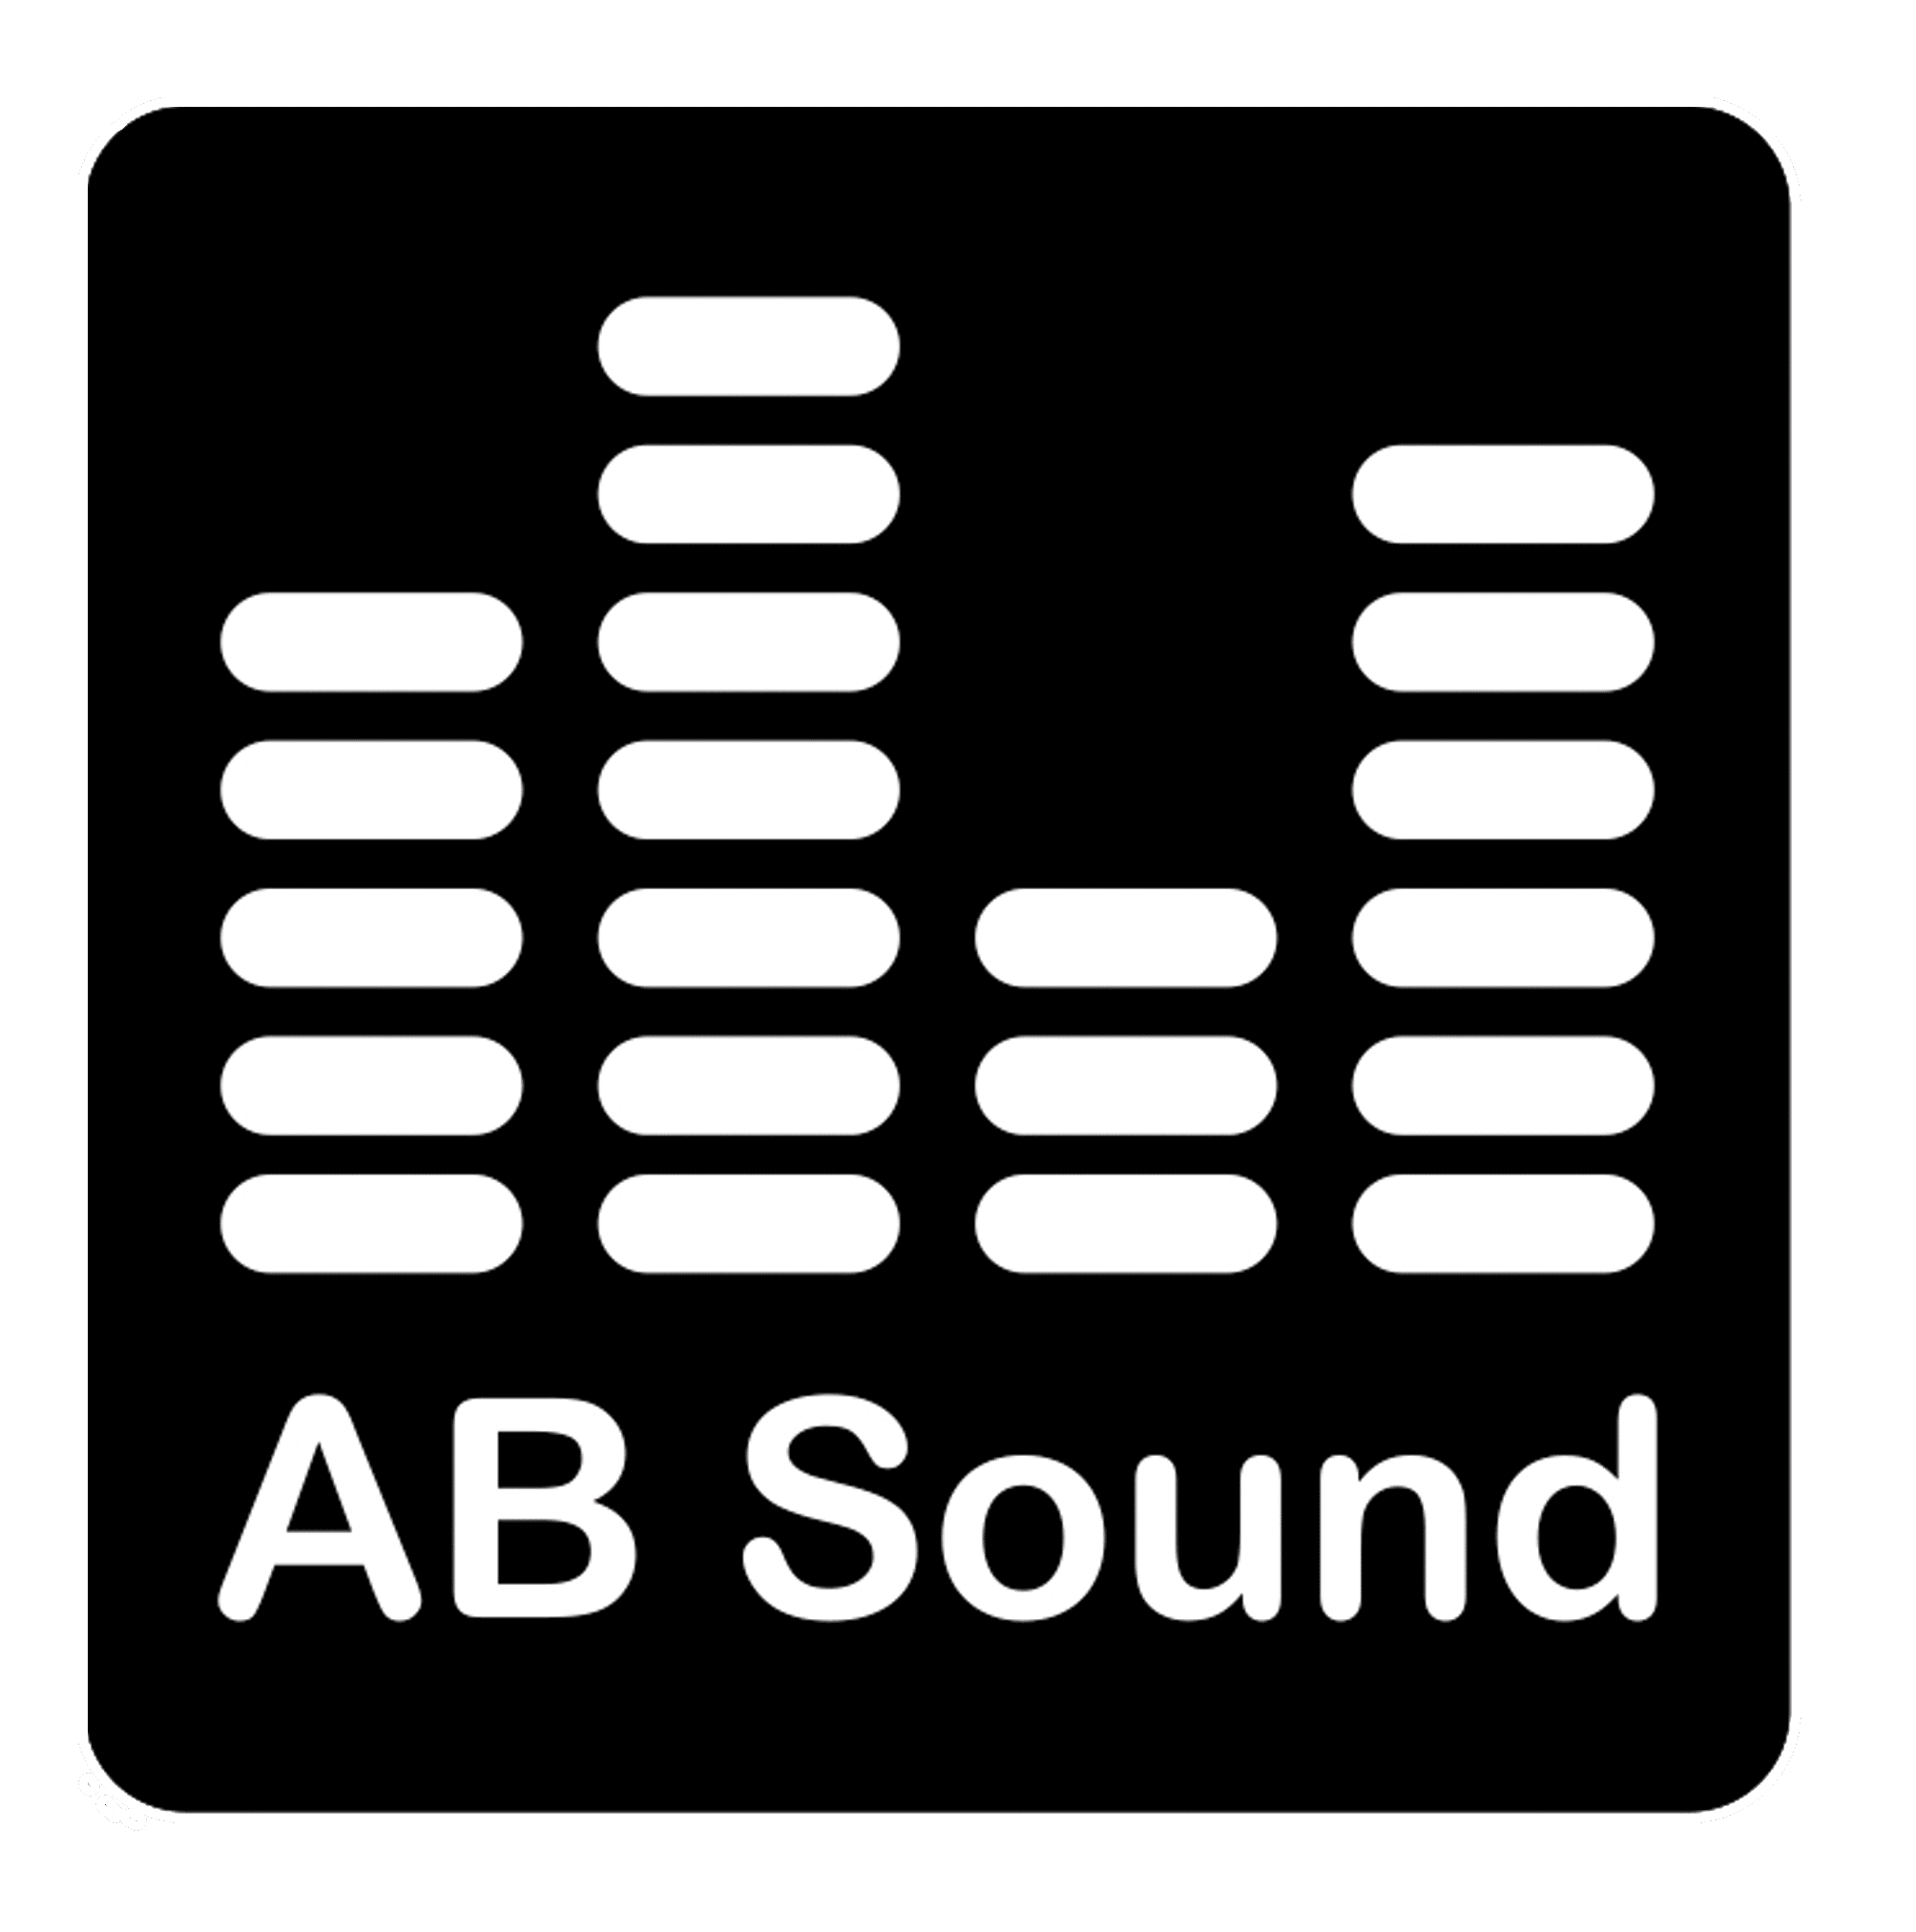 Logo AB Sound